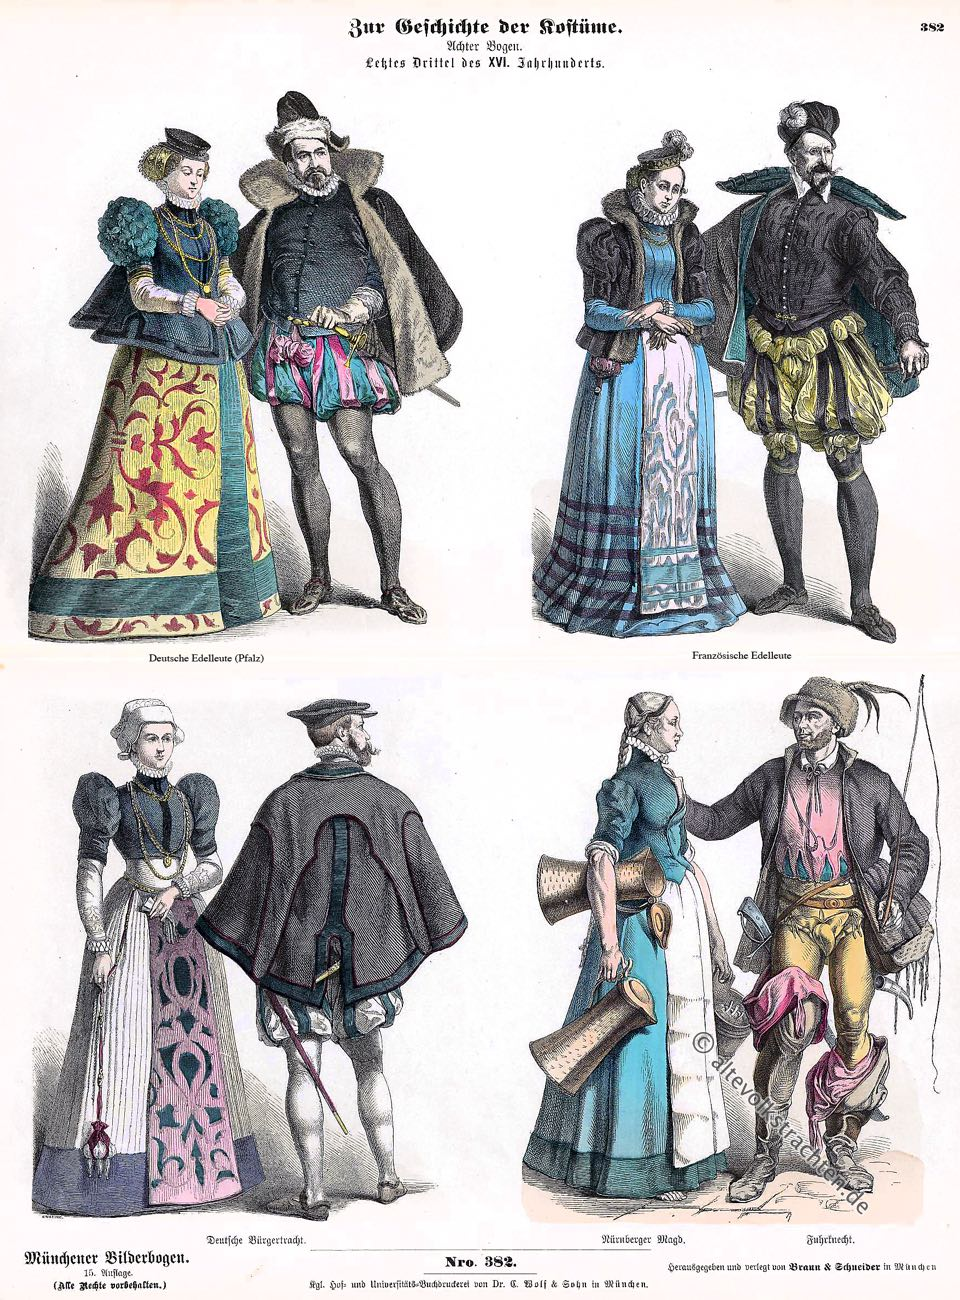 Münchener Bilderbogen, Kostüme, Trachten, Fuhrknecht, Magd, Bürger, Edelleute, Renaissance